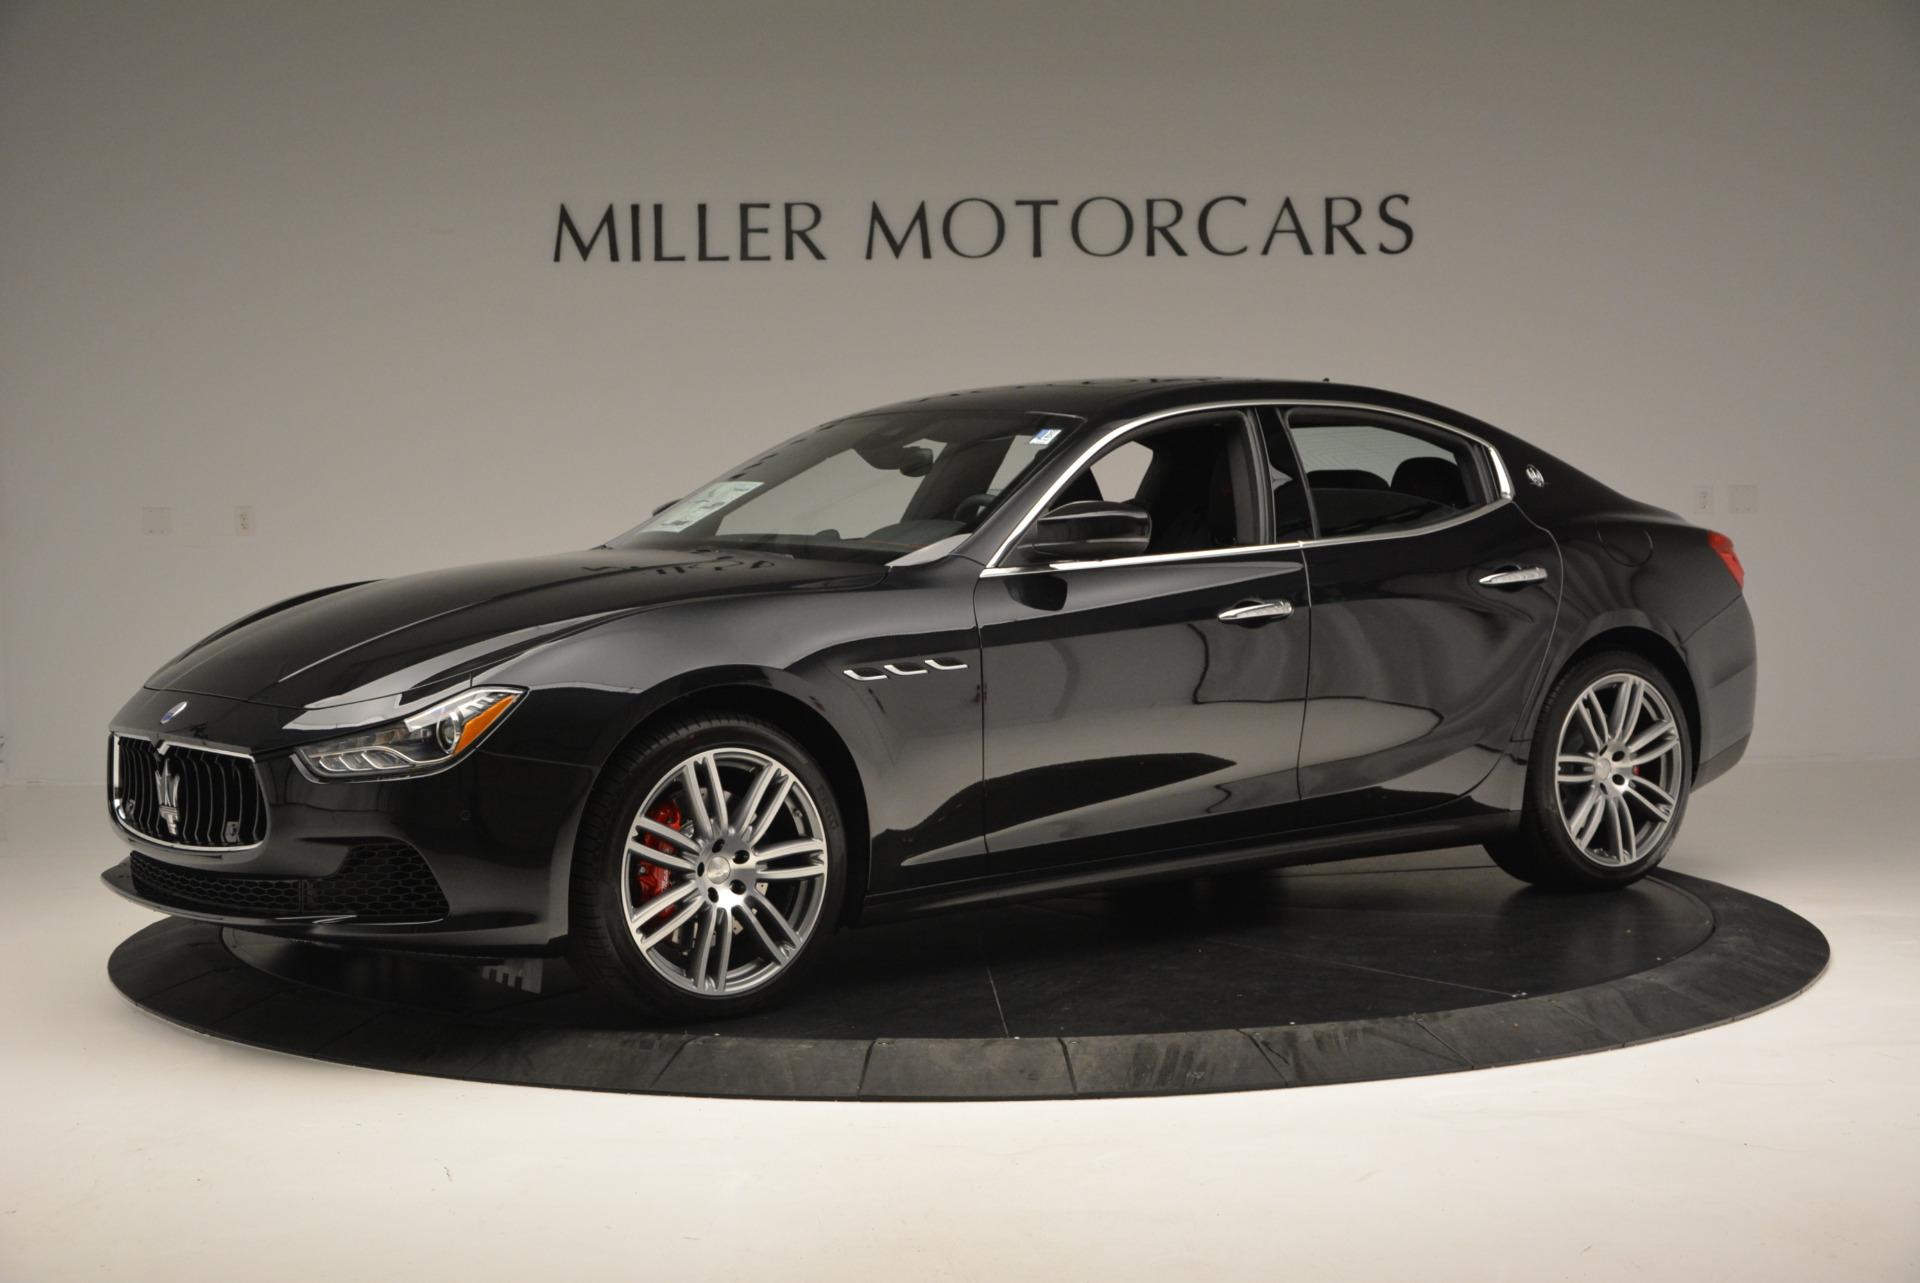 New 2017 Maserati Ghibli S Q4 For Sale In Westport, CT 630_p2